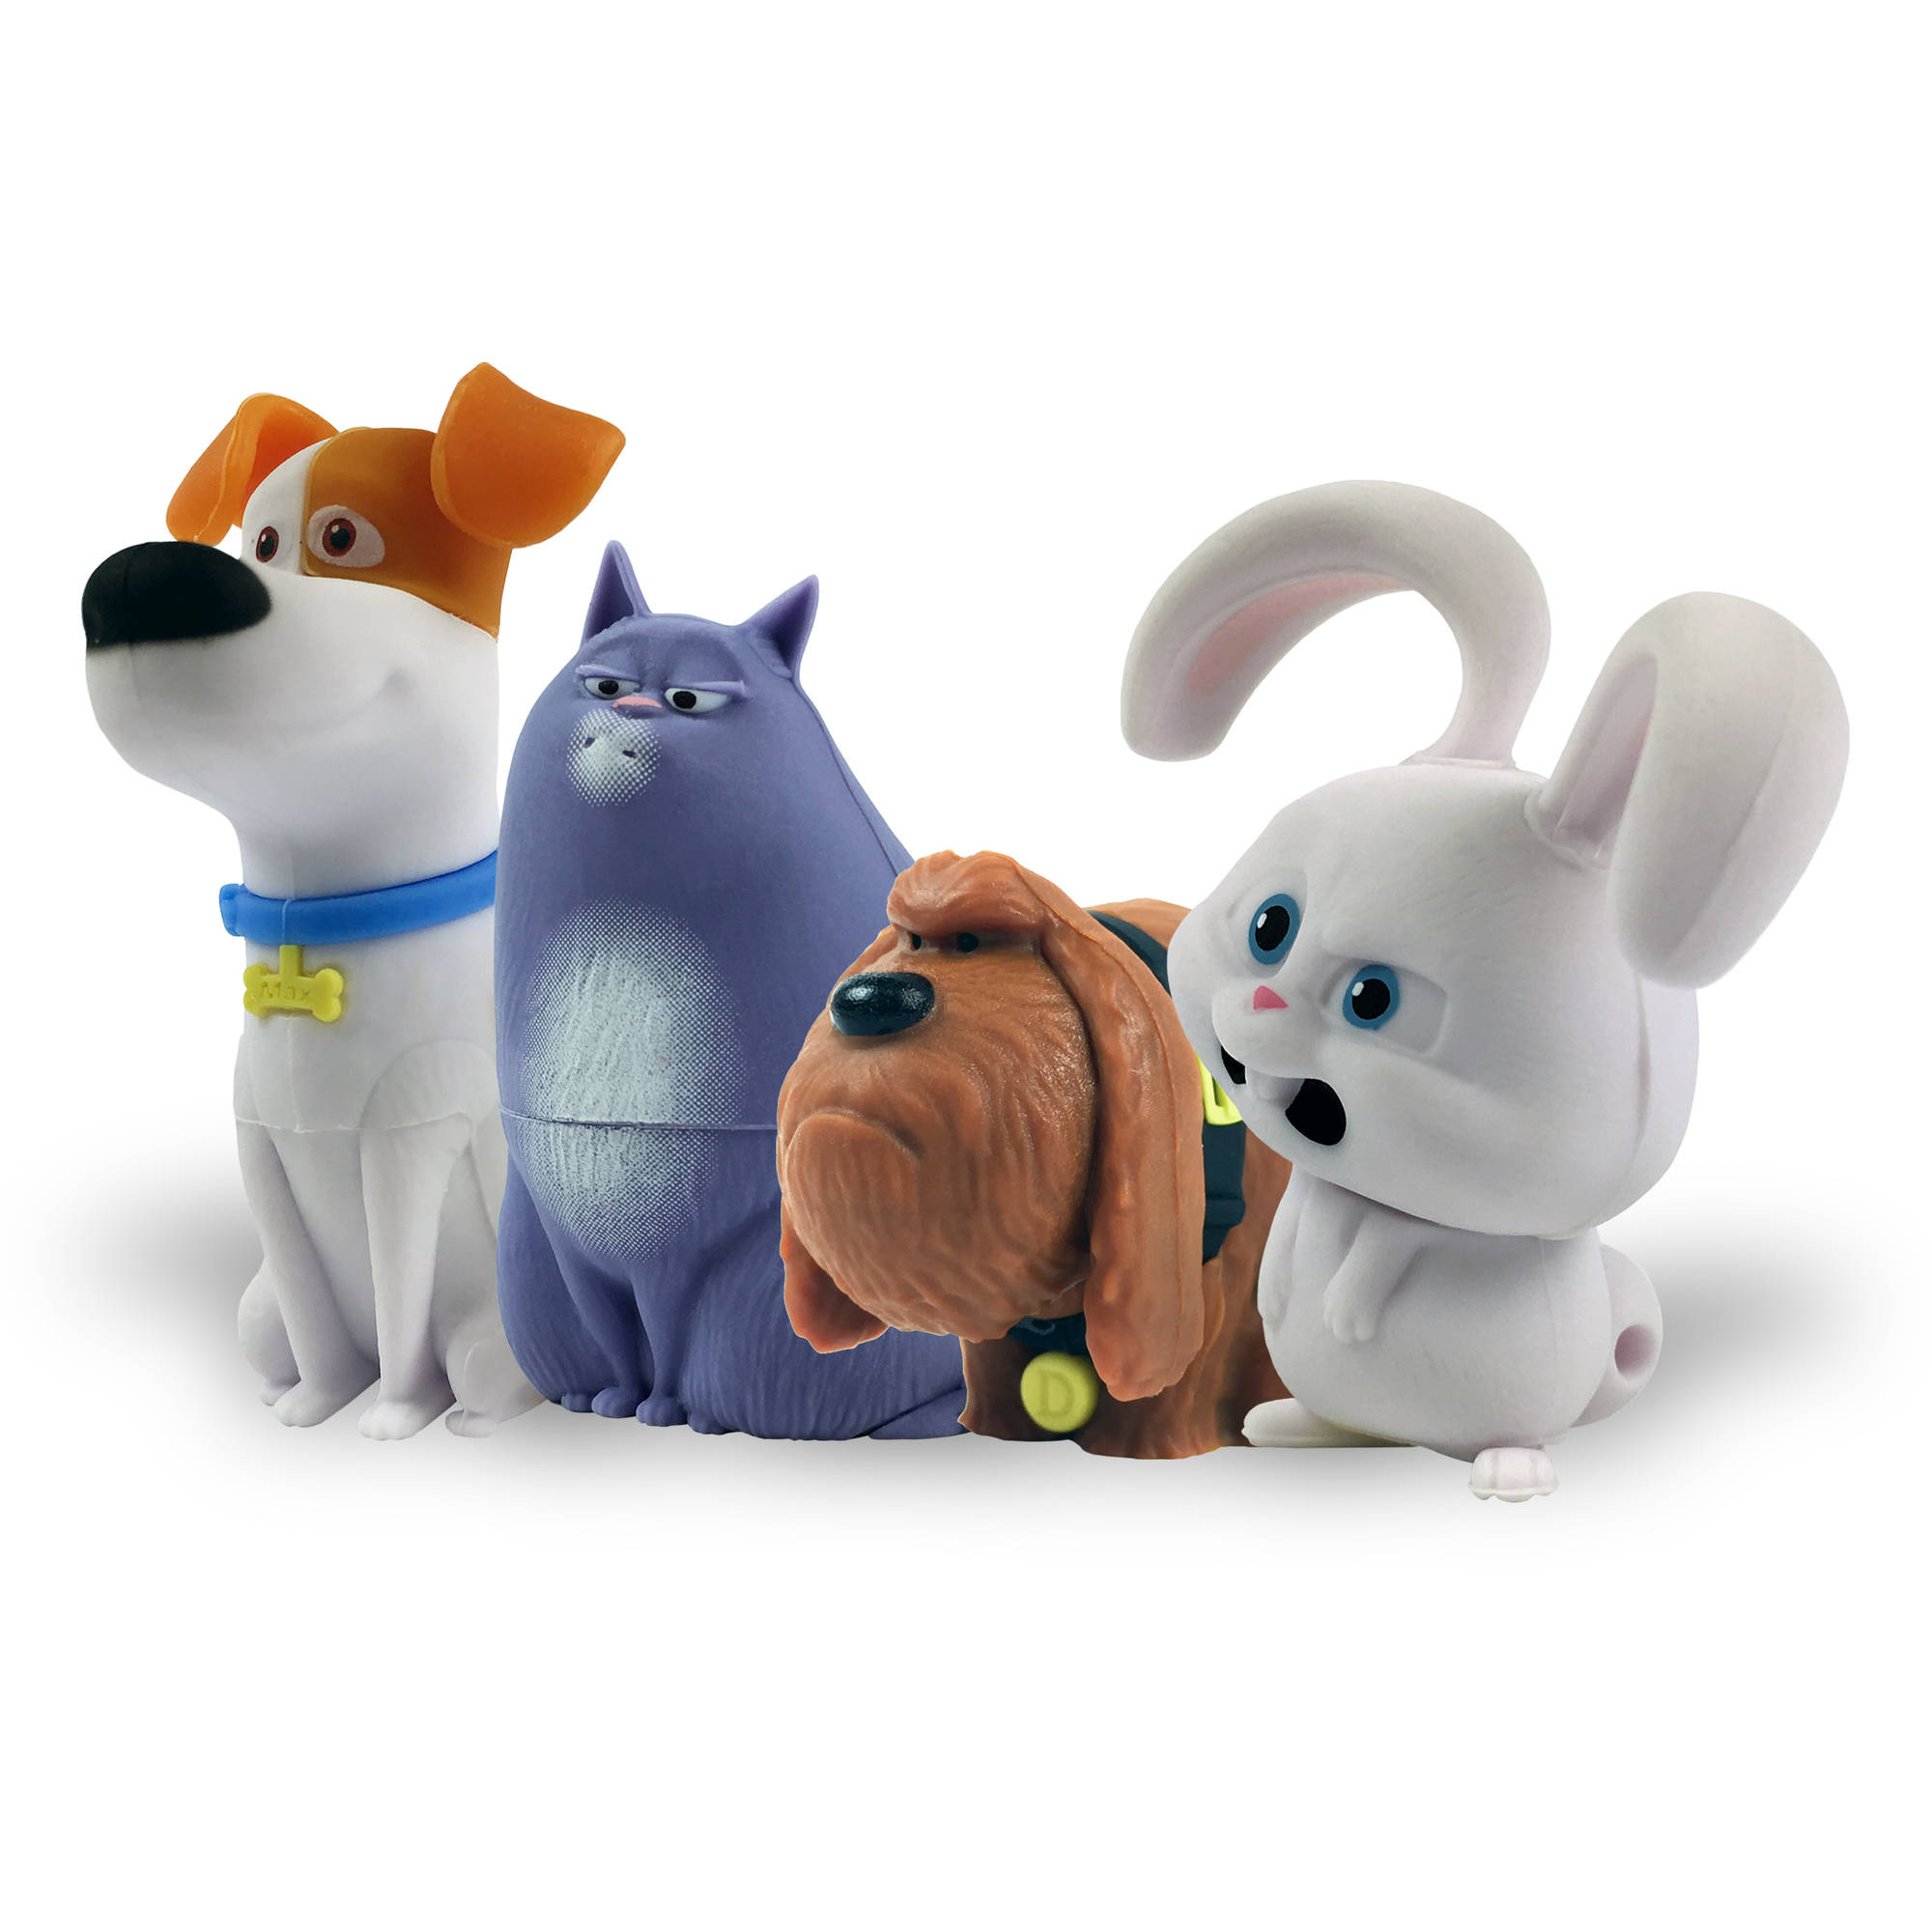 Secret Life of Pets, 4-Pack Character Assortment, 16GB USB Flash Drive